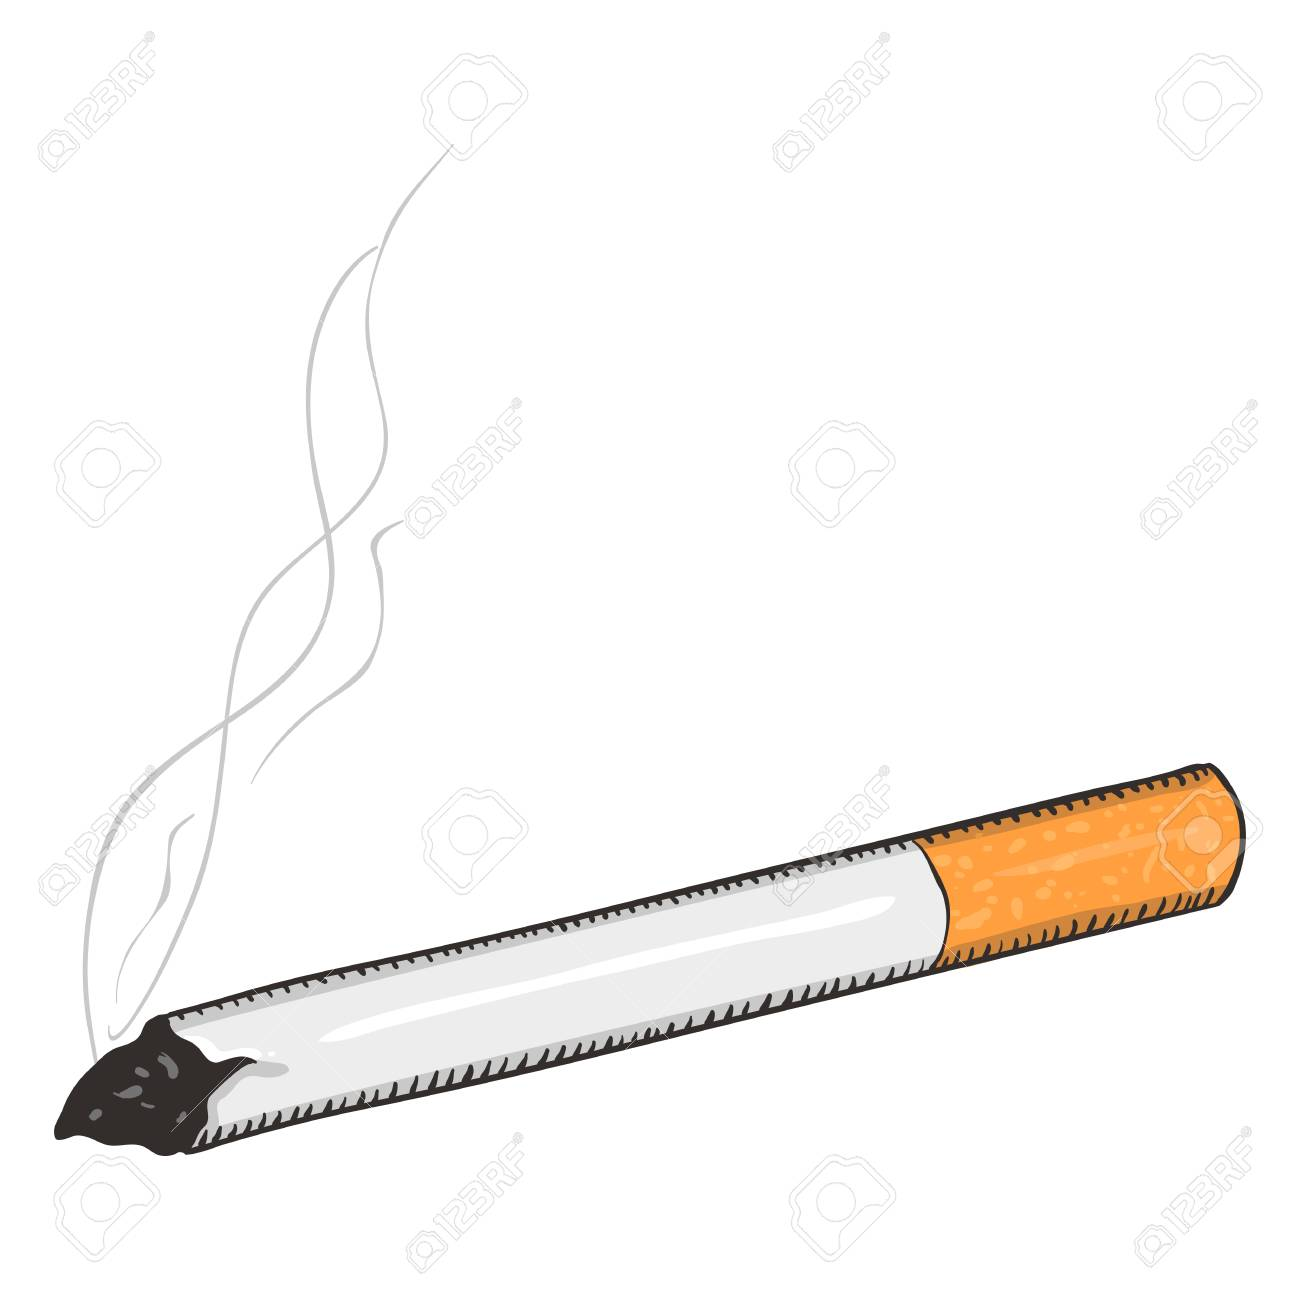 vector single cartoon cigarette with filter on white background rh 123rf com cigarette cartons uk cigarette cartons